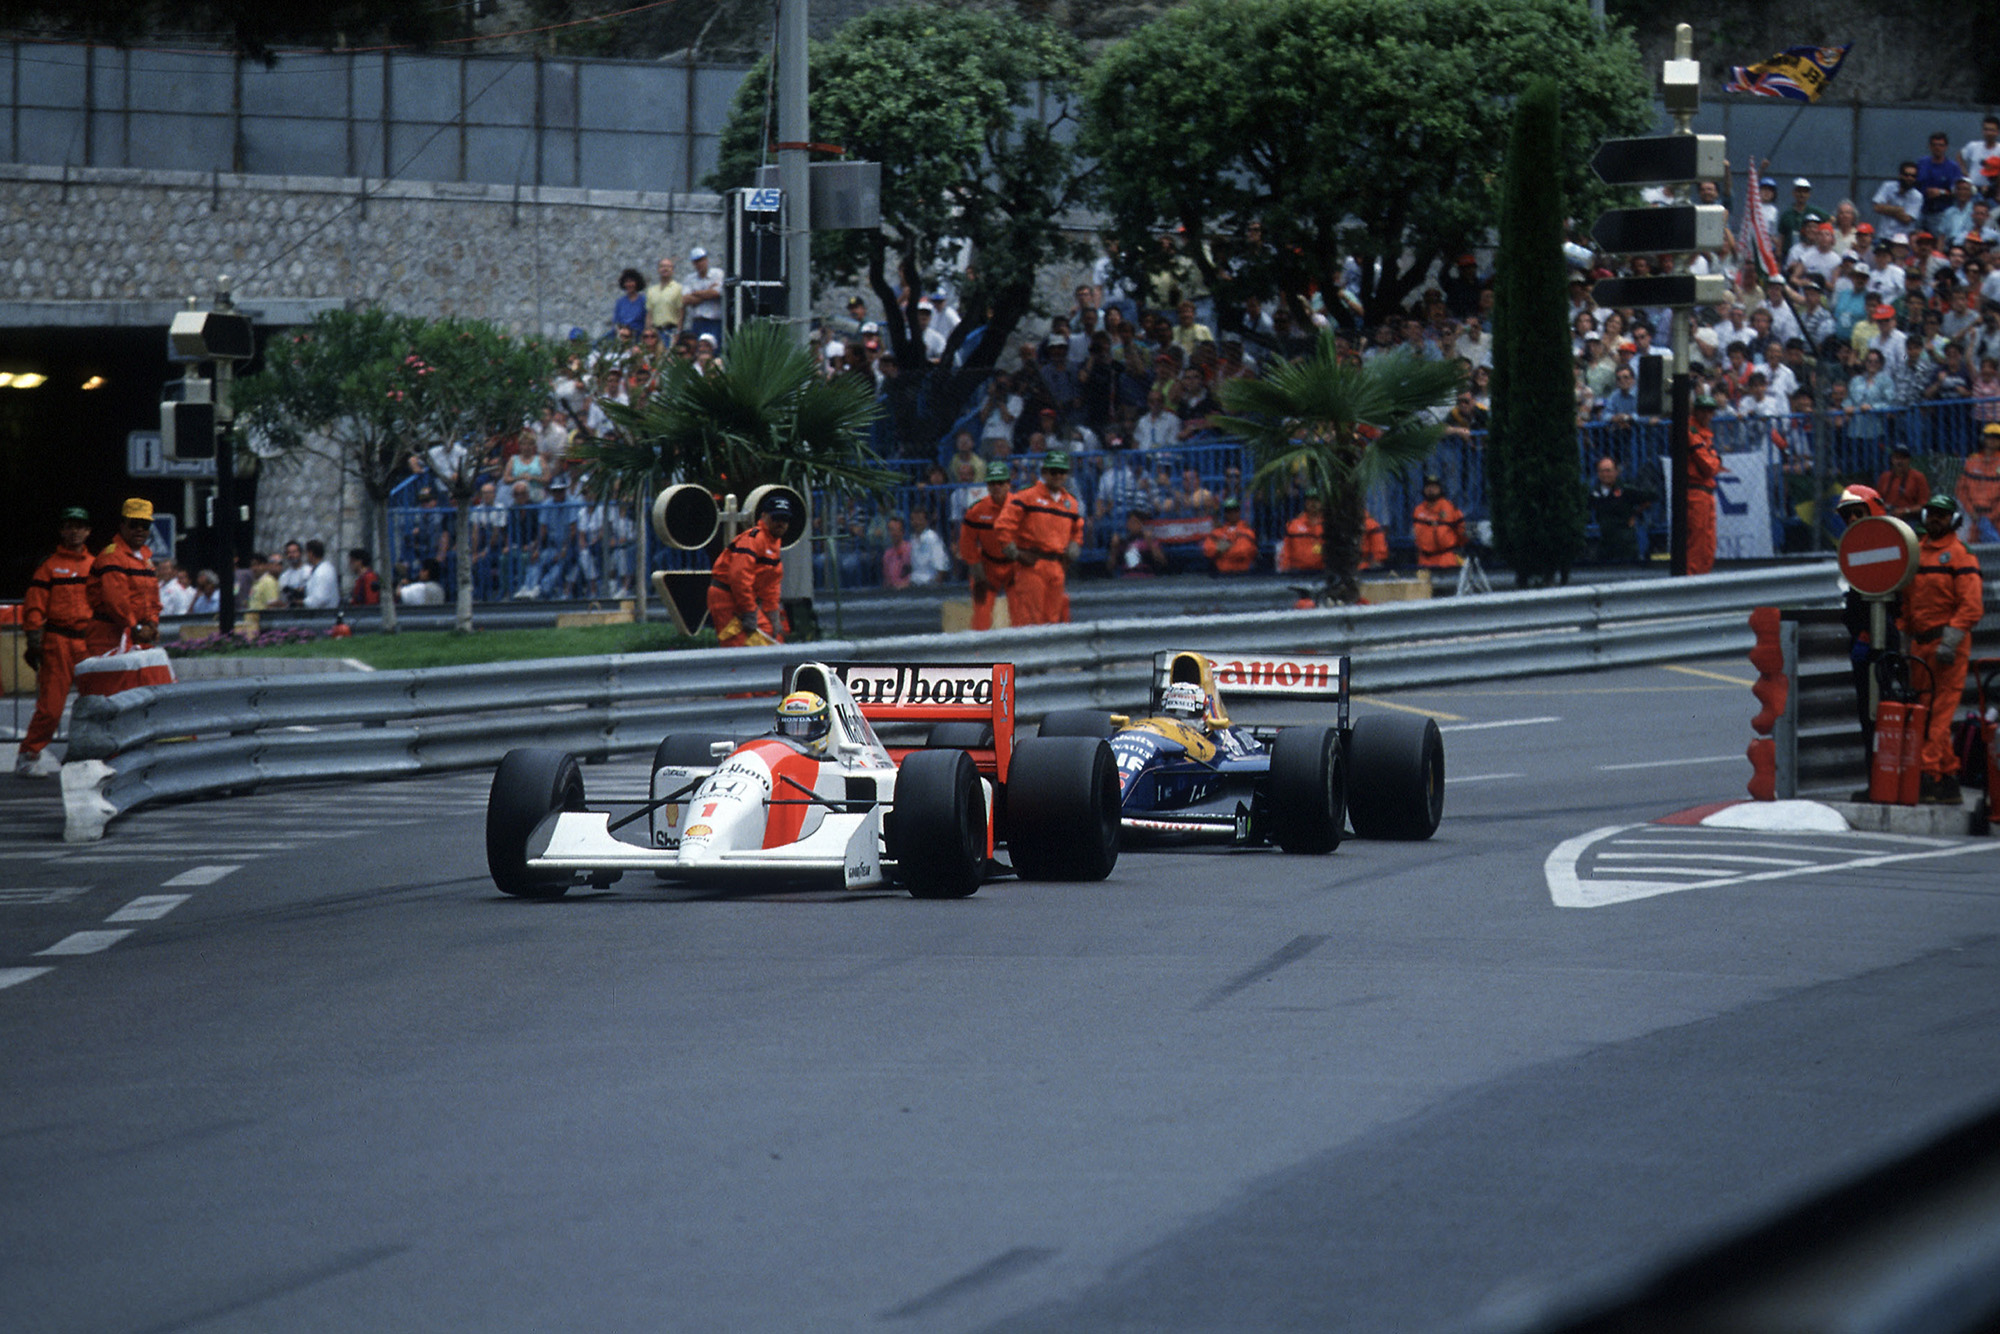 Ayrton Senna defends from Nigel Mansell at the 1992 Monaco Grand Prix